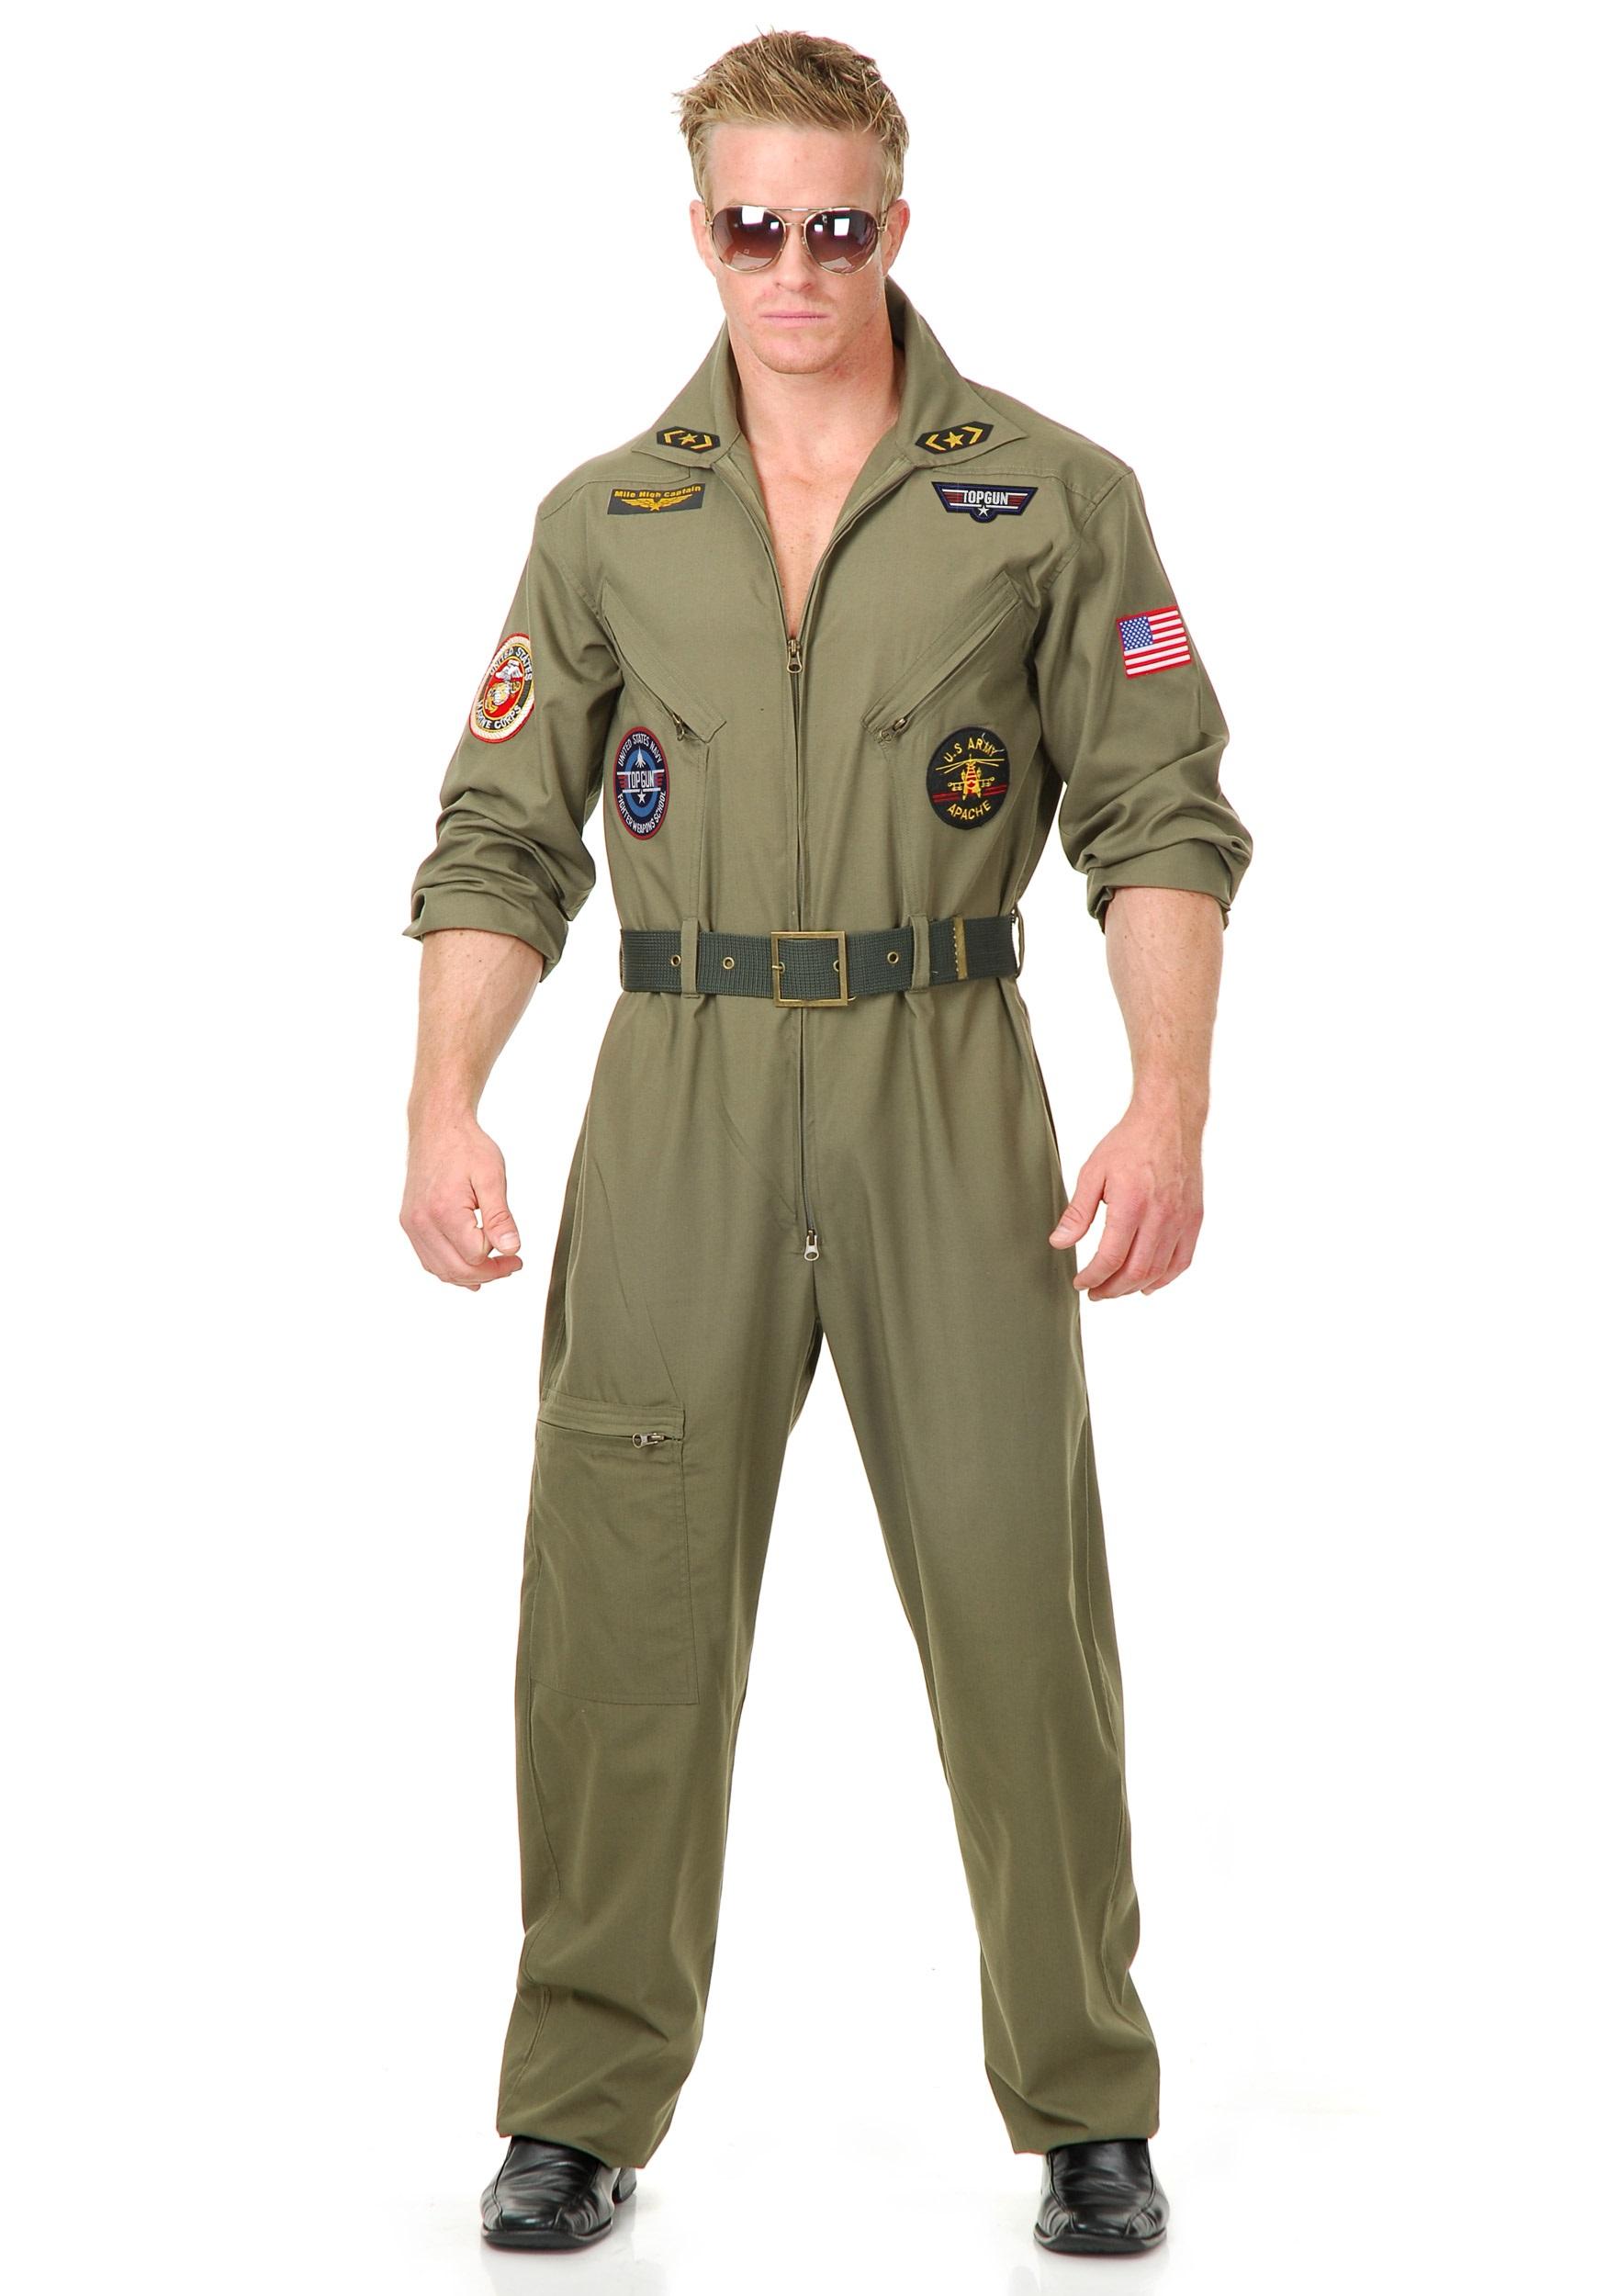 Plus Size Air Force Pilot Costume  sc 1 st  Halloween Costumes & Plus Size Air Force Pilot Costume - Halloween Costumes